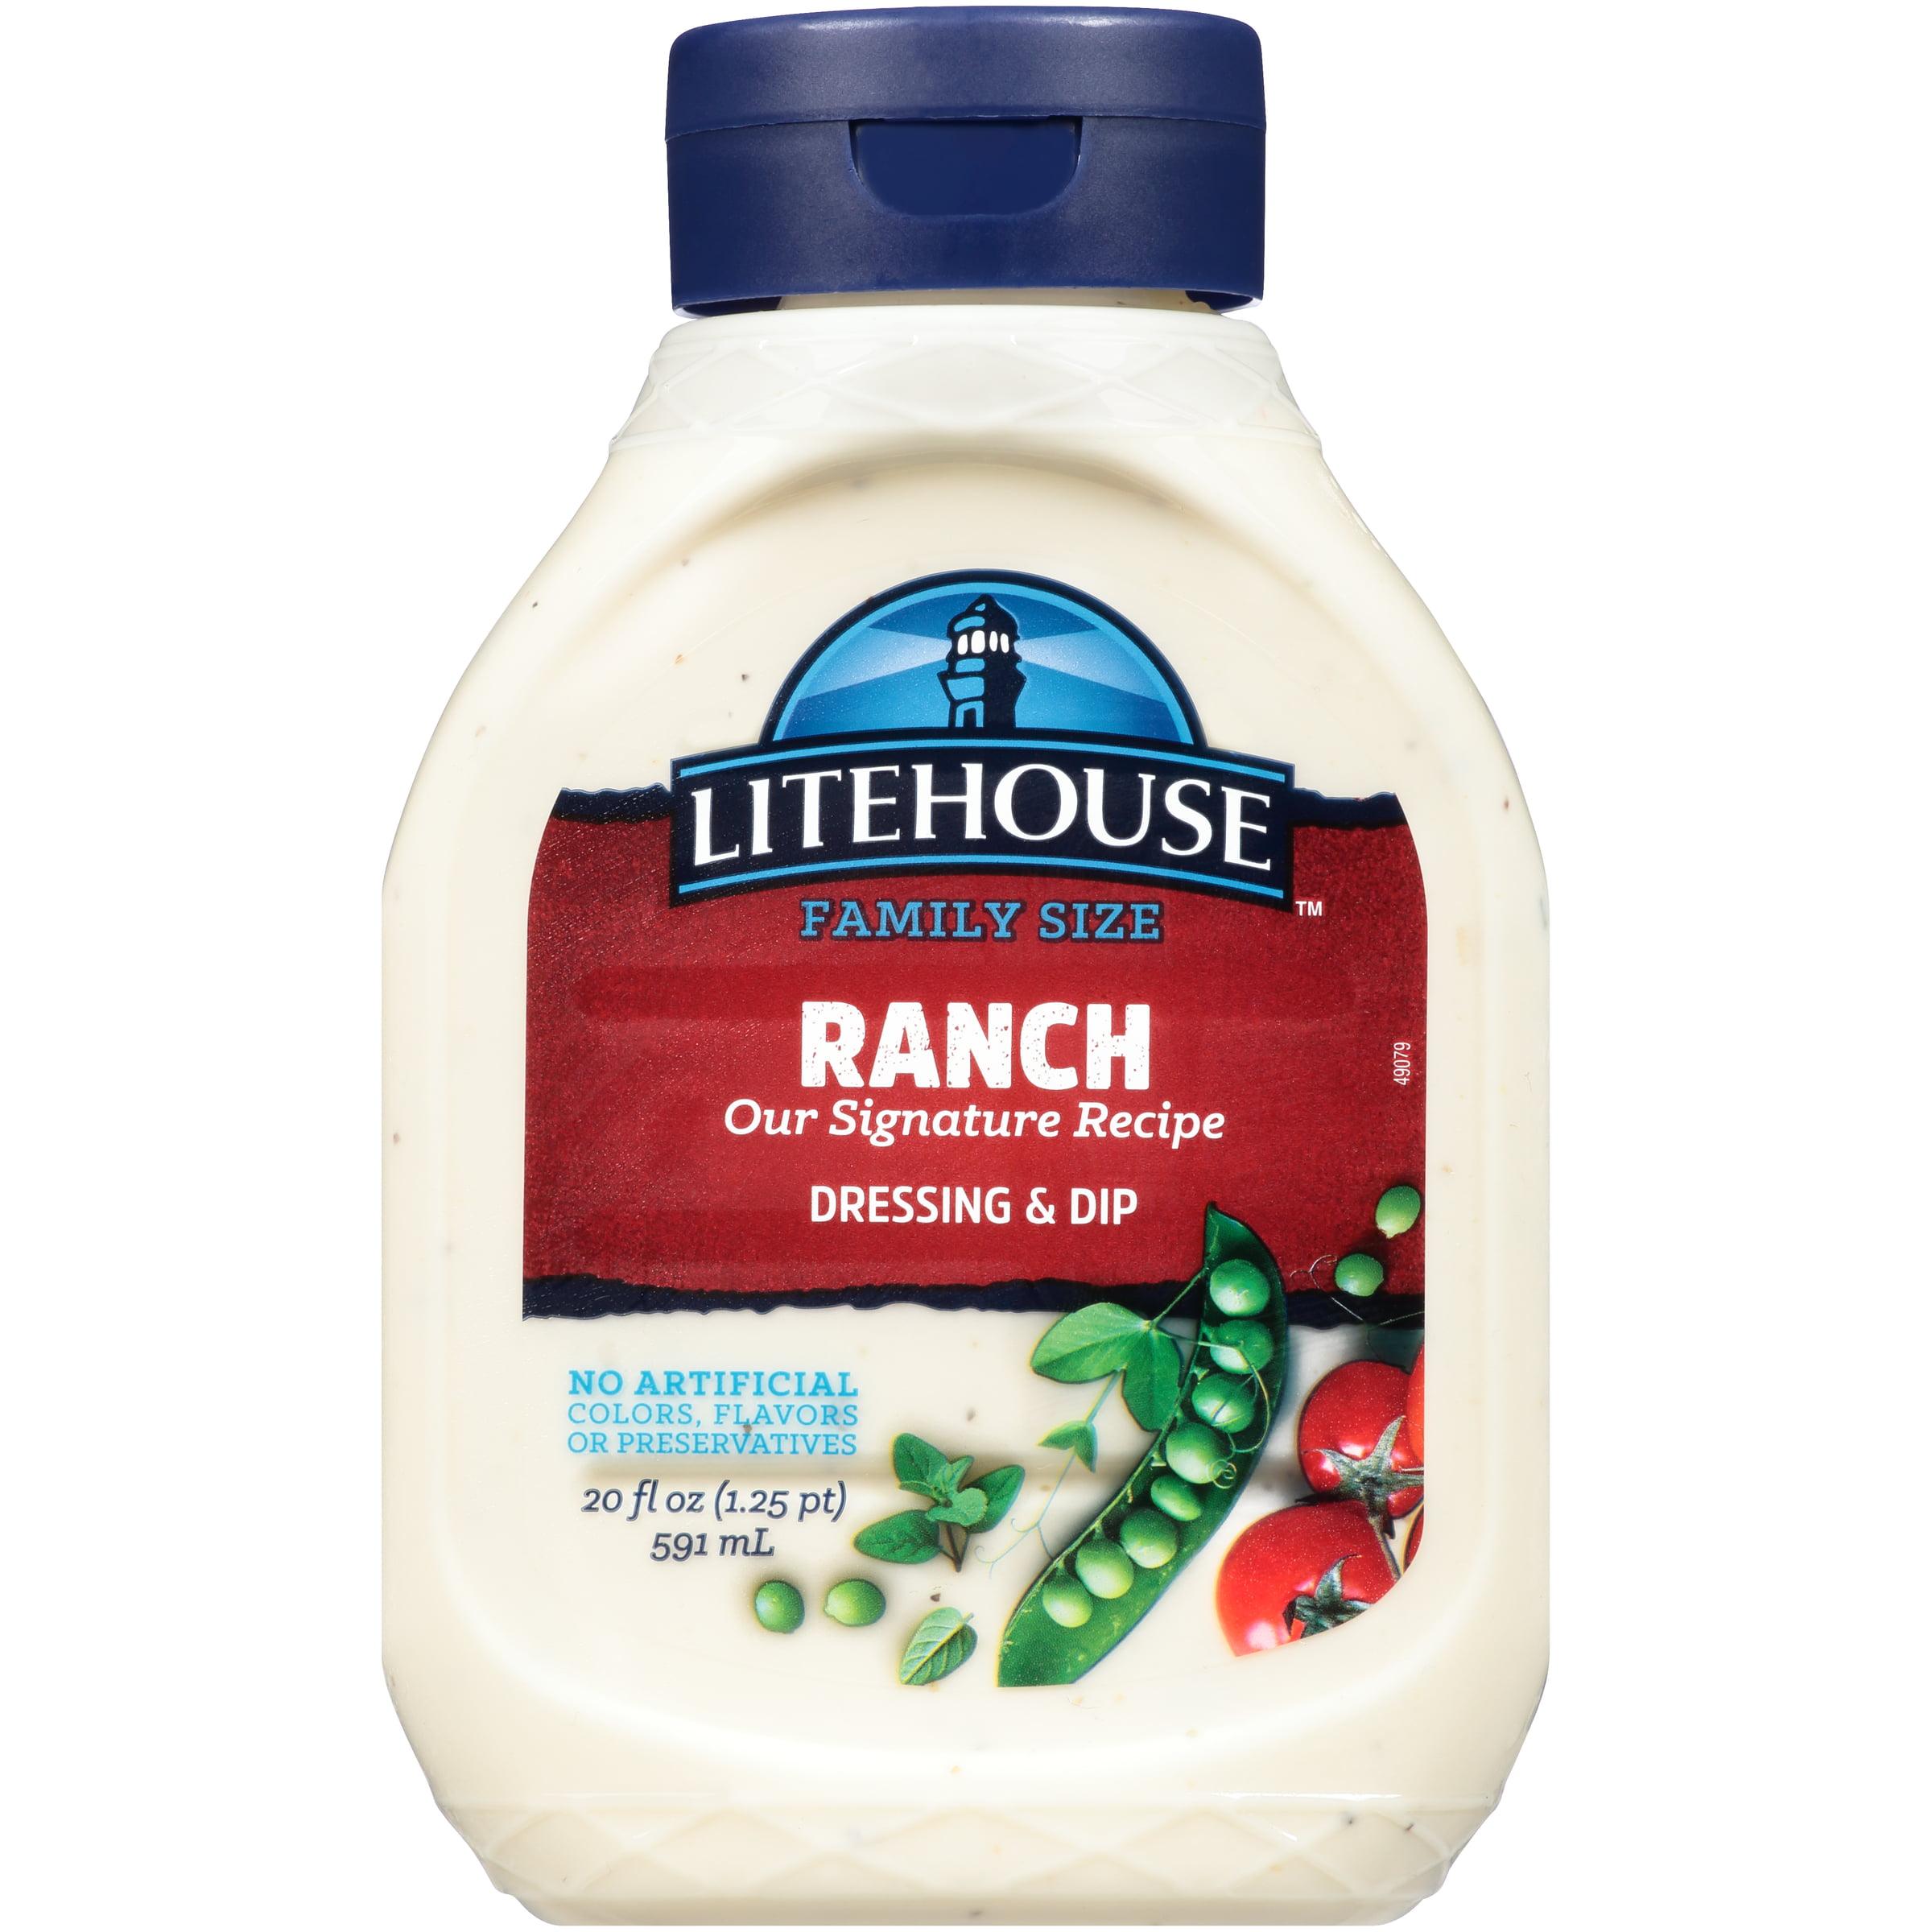 Litehouse Signature Recipe Ranch Dressing & Dip 20 Oz Plastic Bottle